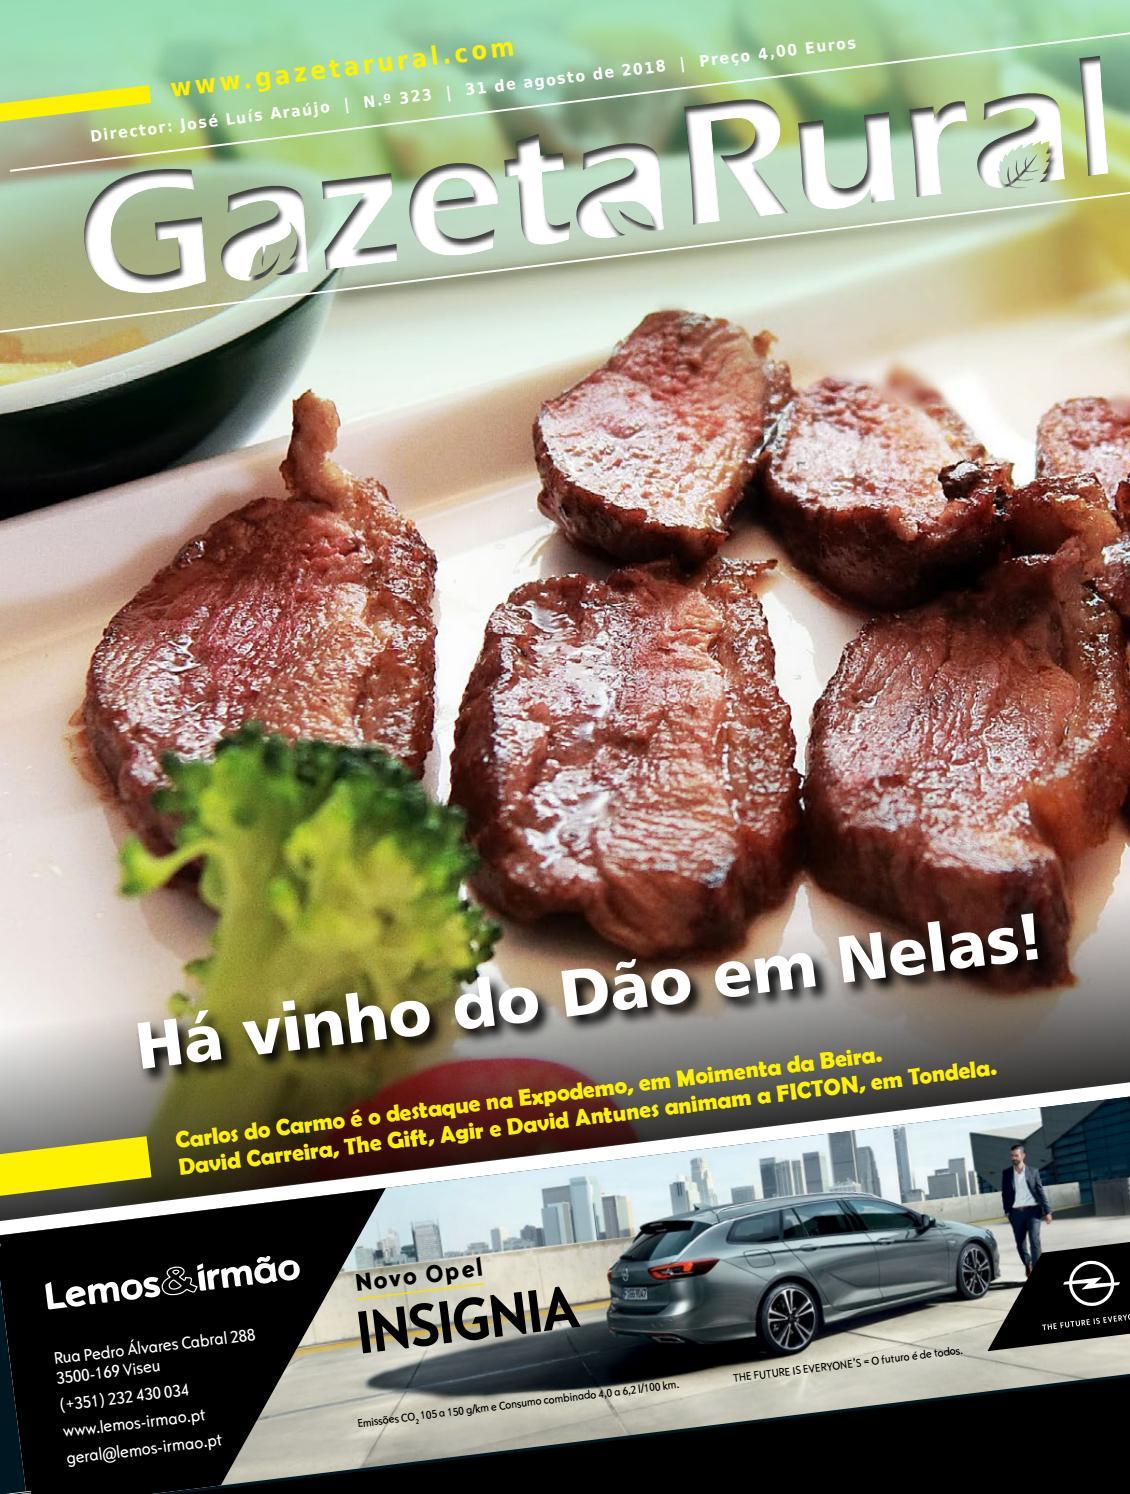 d5ecf32c95 Gazeta Rural nº 323 by José Araújo - issuu